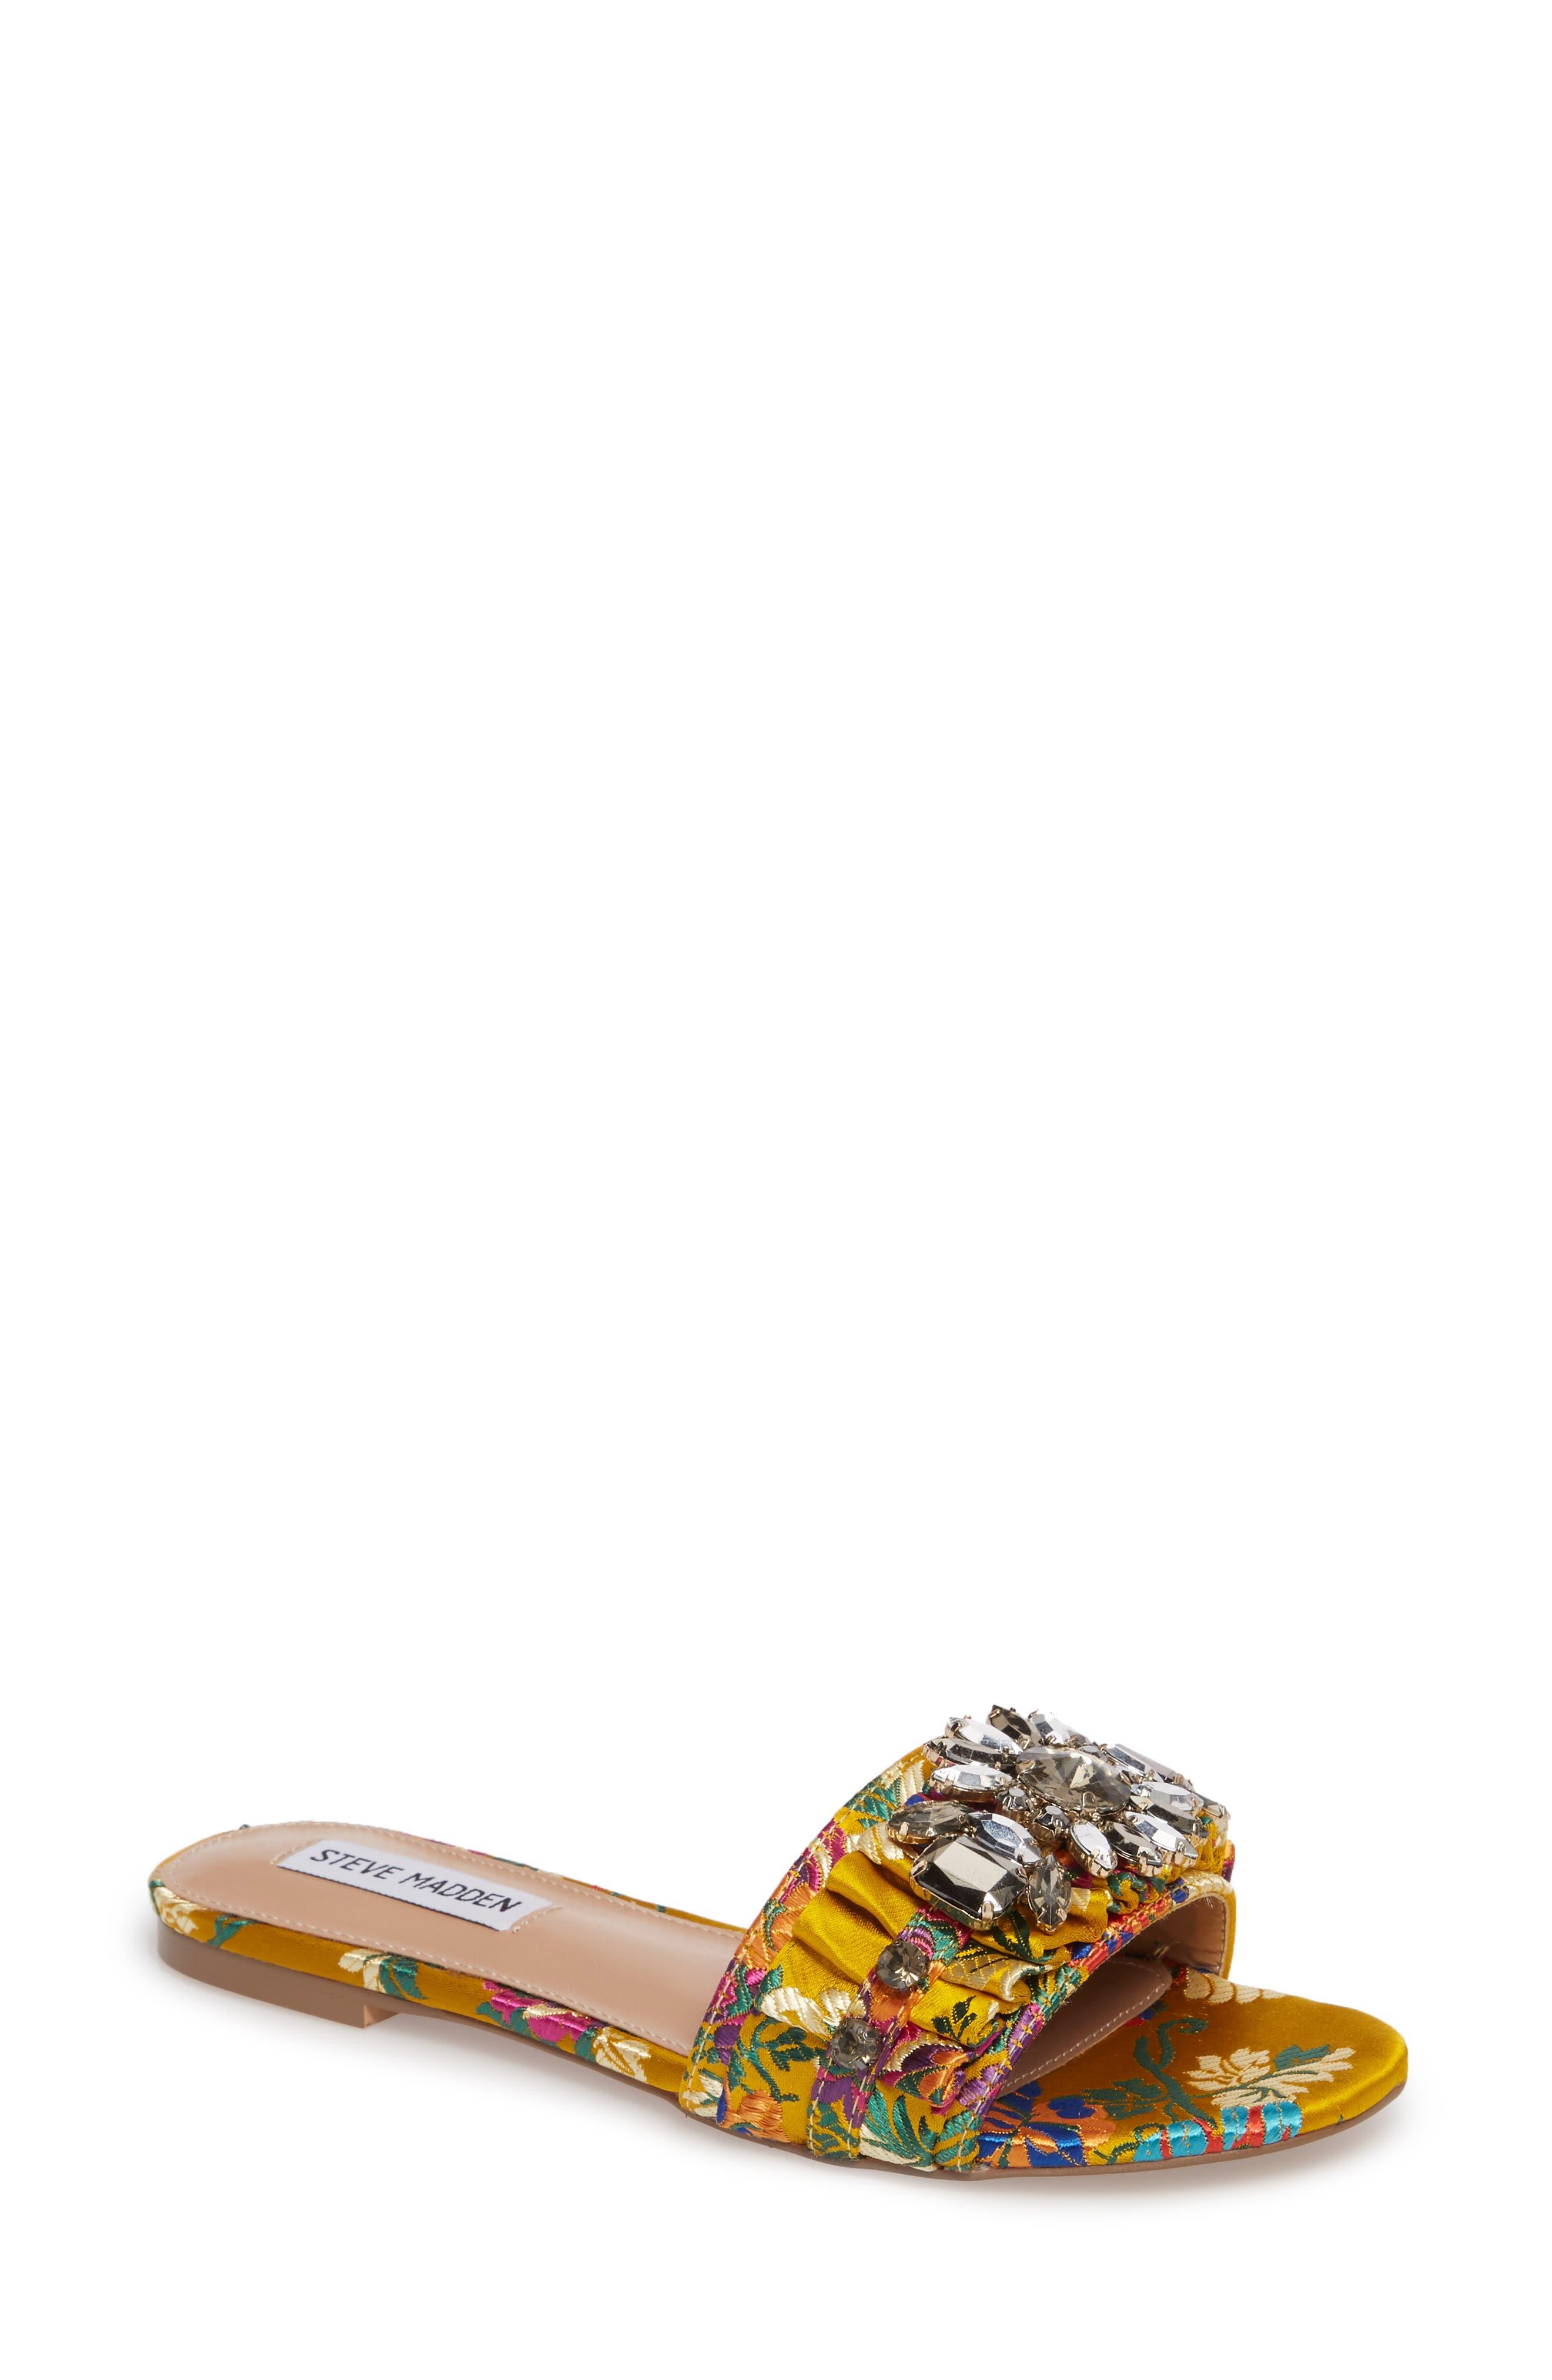 Main Image - Steve Madden Pomona Crystal Embellished Slide Sandal (Women)